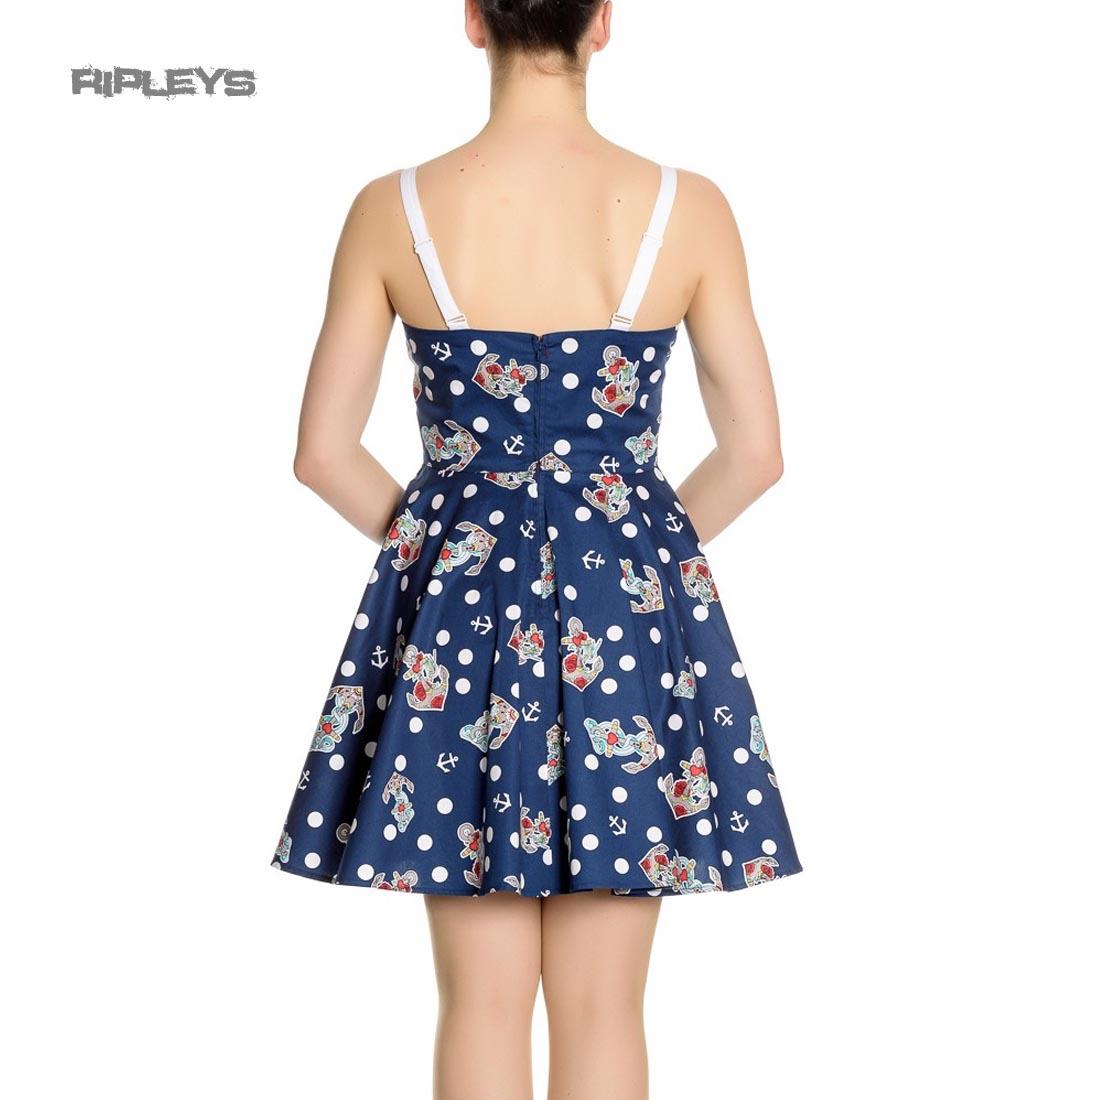 Hell-Bunny-Navy-Blue-50s-Nautical-Mini-Dress-OCEANA-Polka-Dot-All-Sizes thumbnail 4